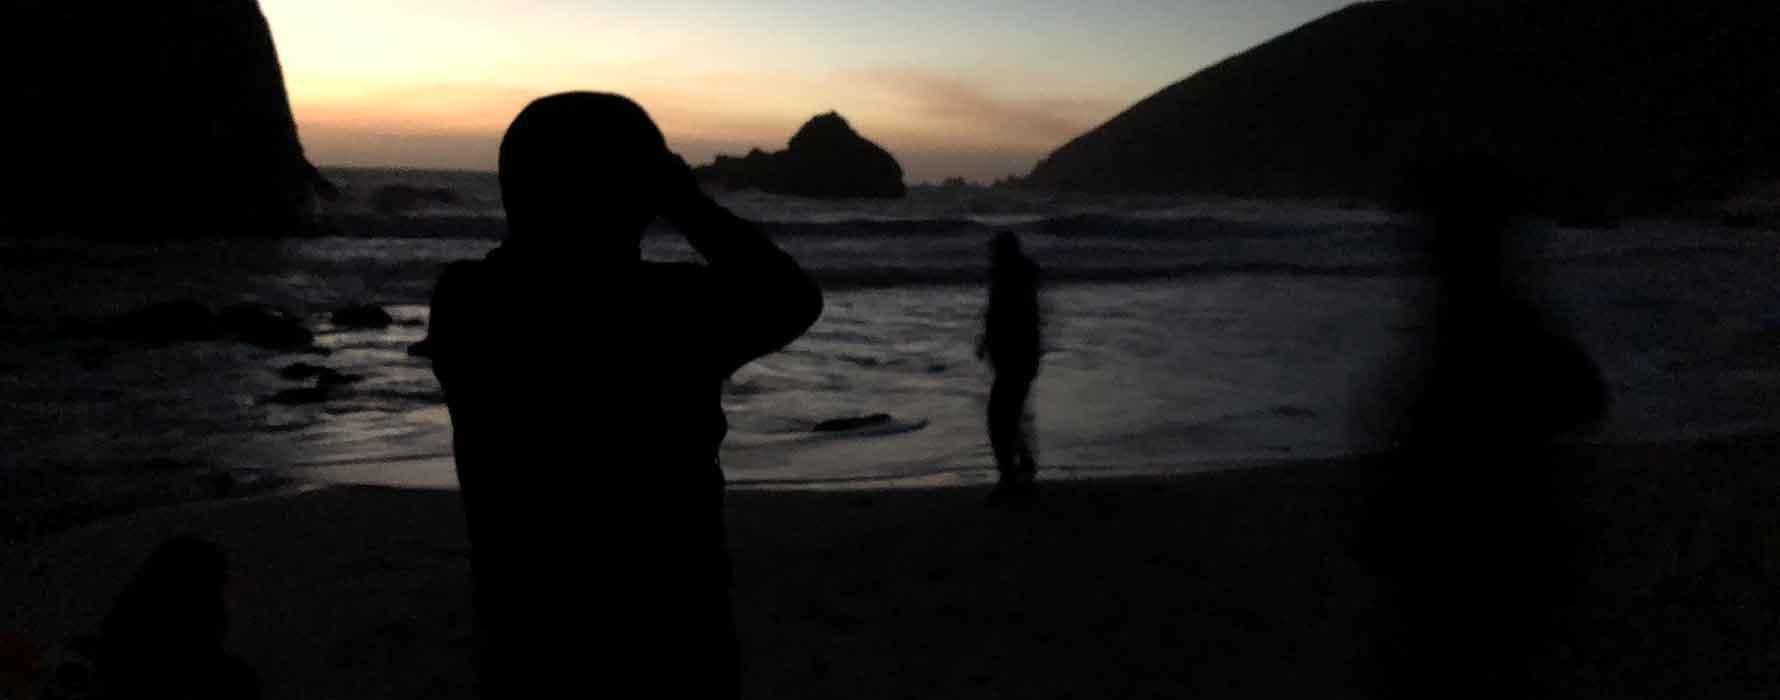 Students at ocean at sunset